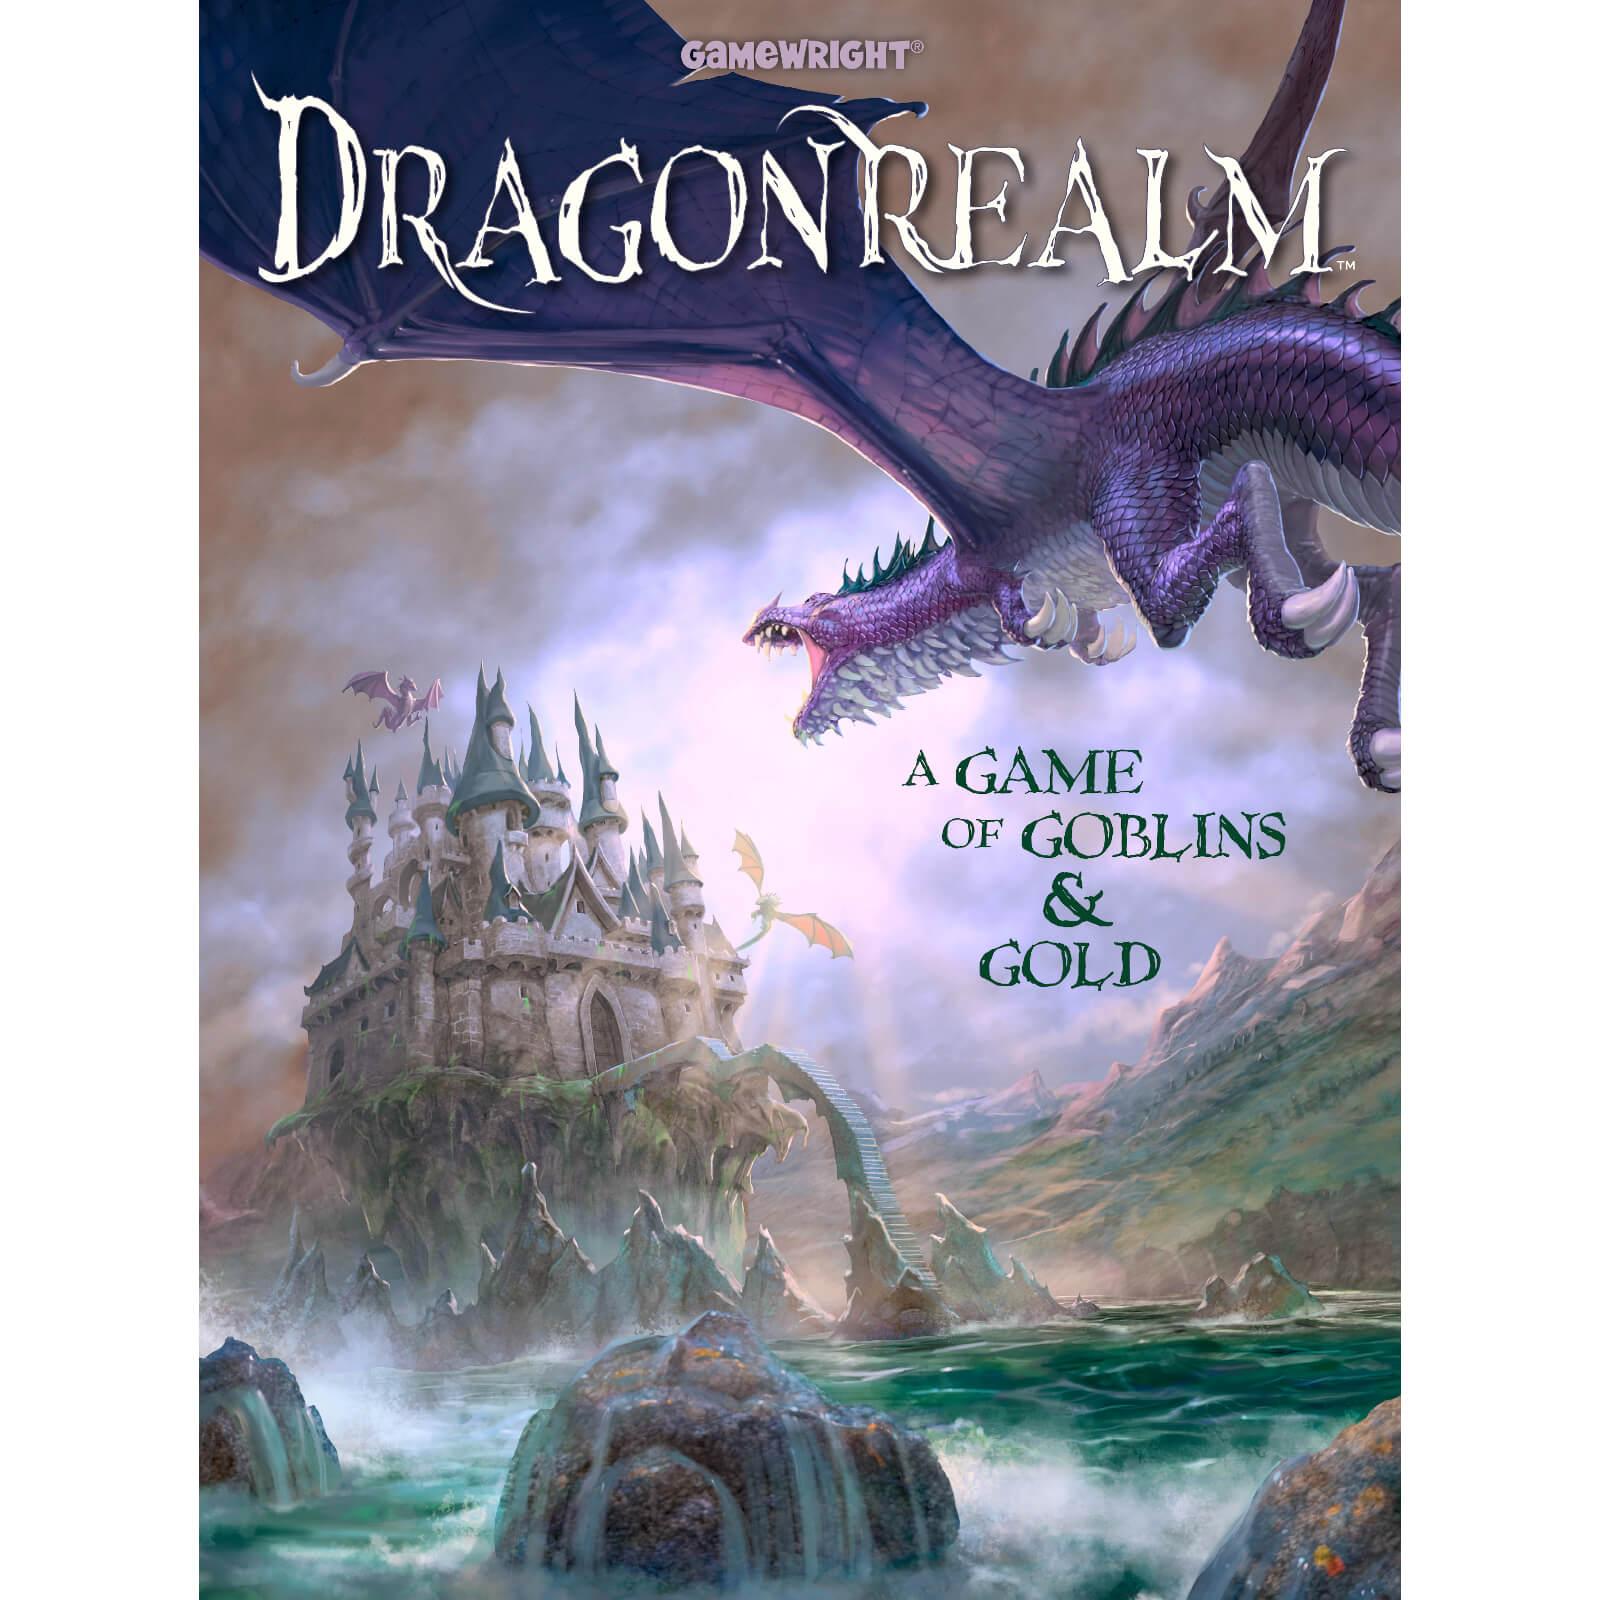 Image of Dragonrealm Board Game